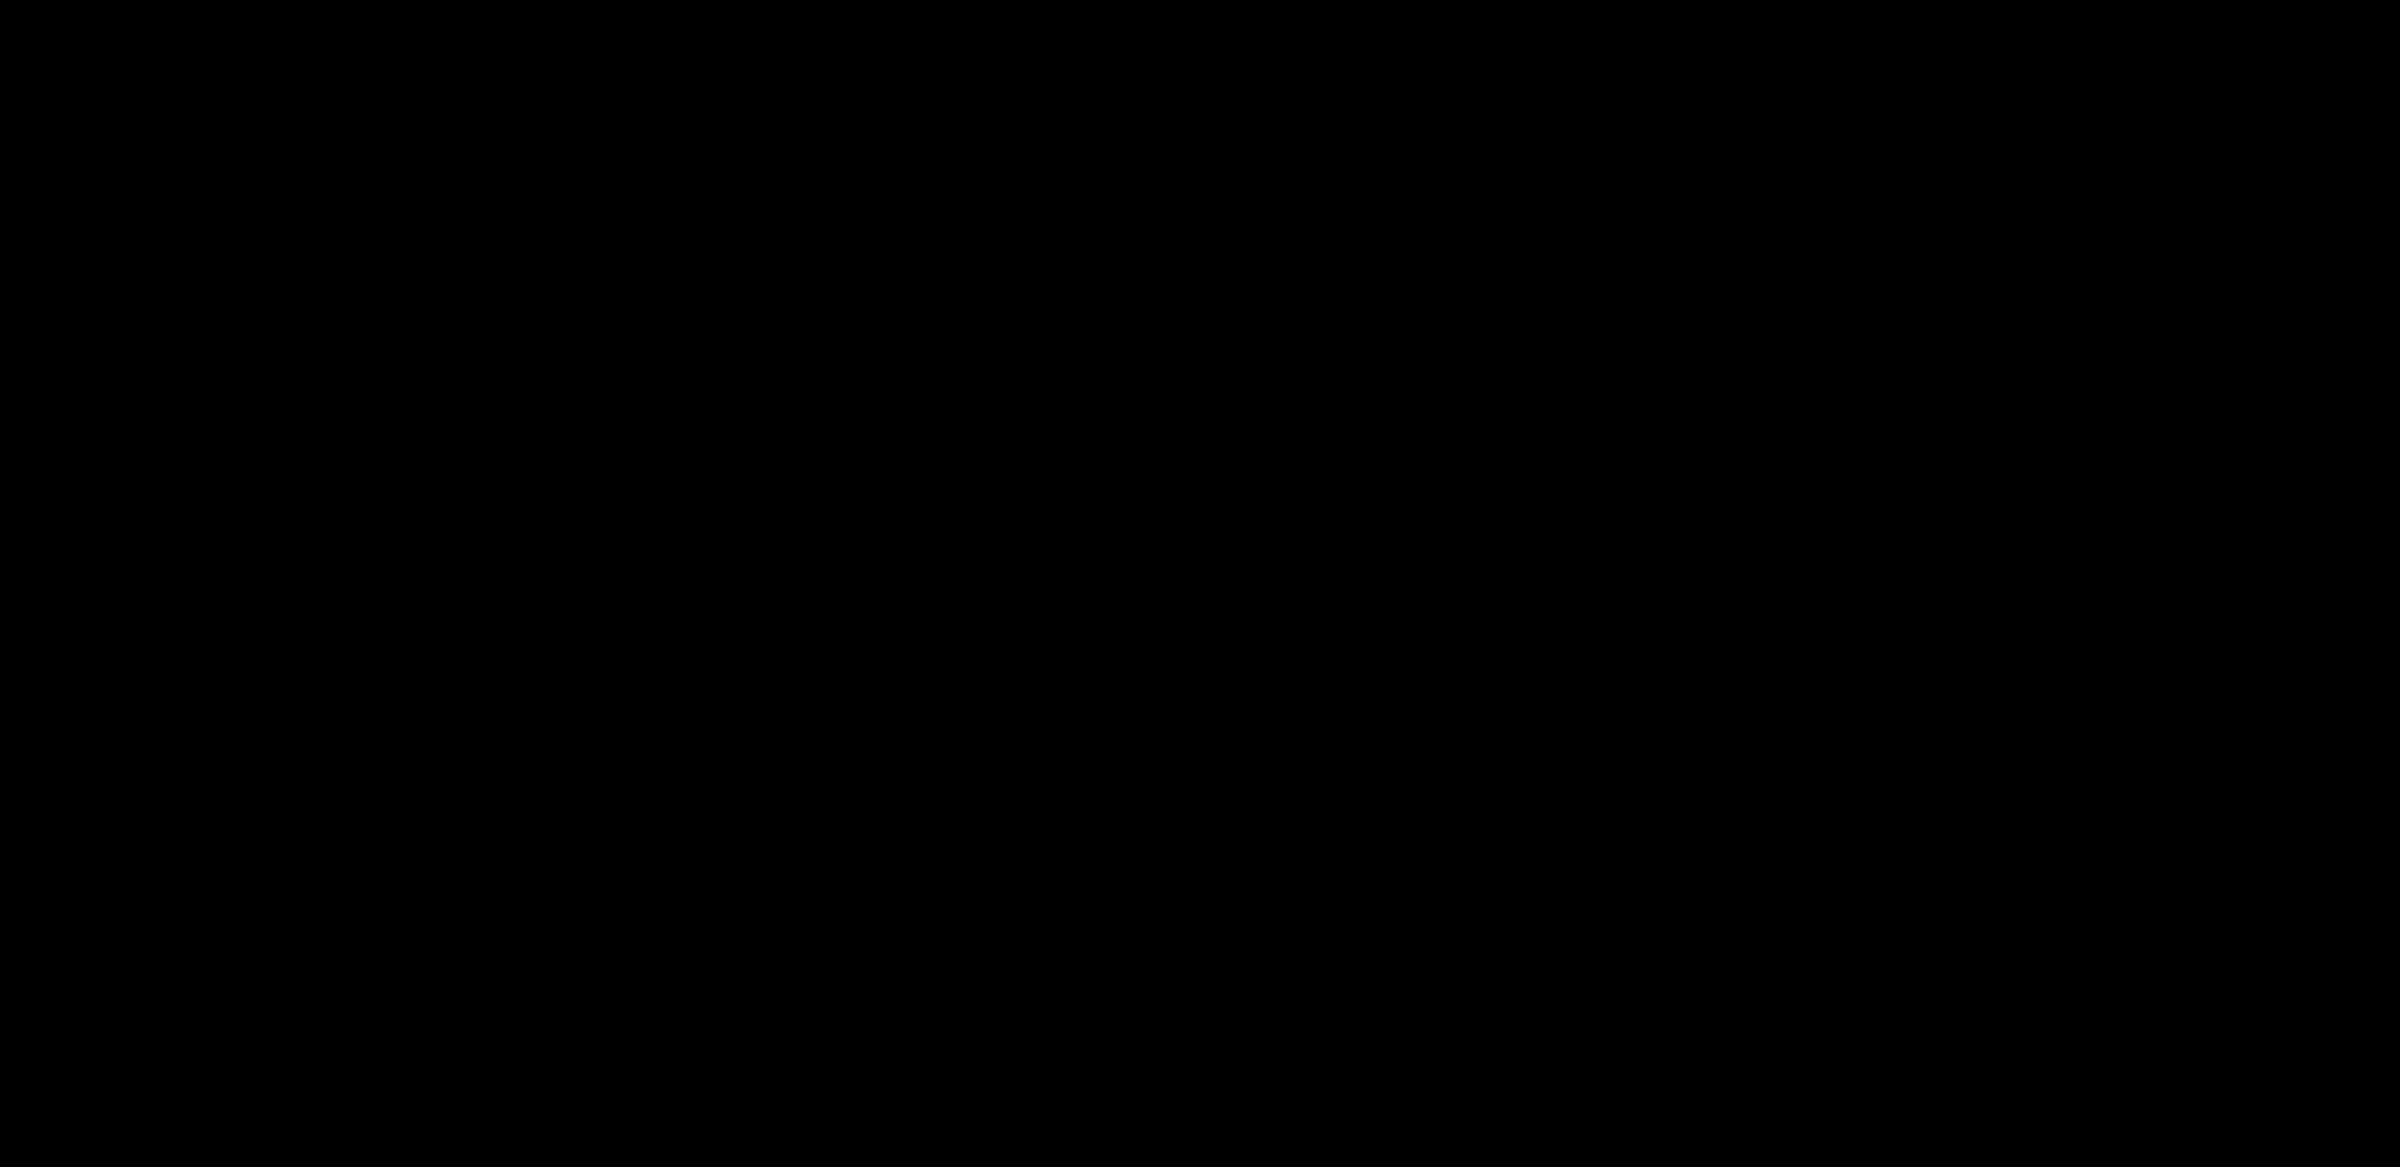 tidal-logo-png-transparent